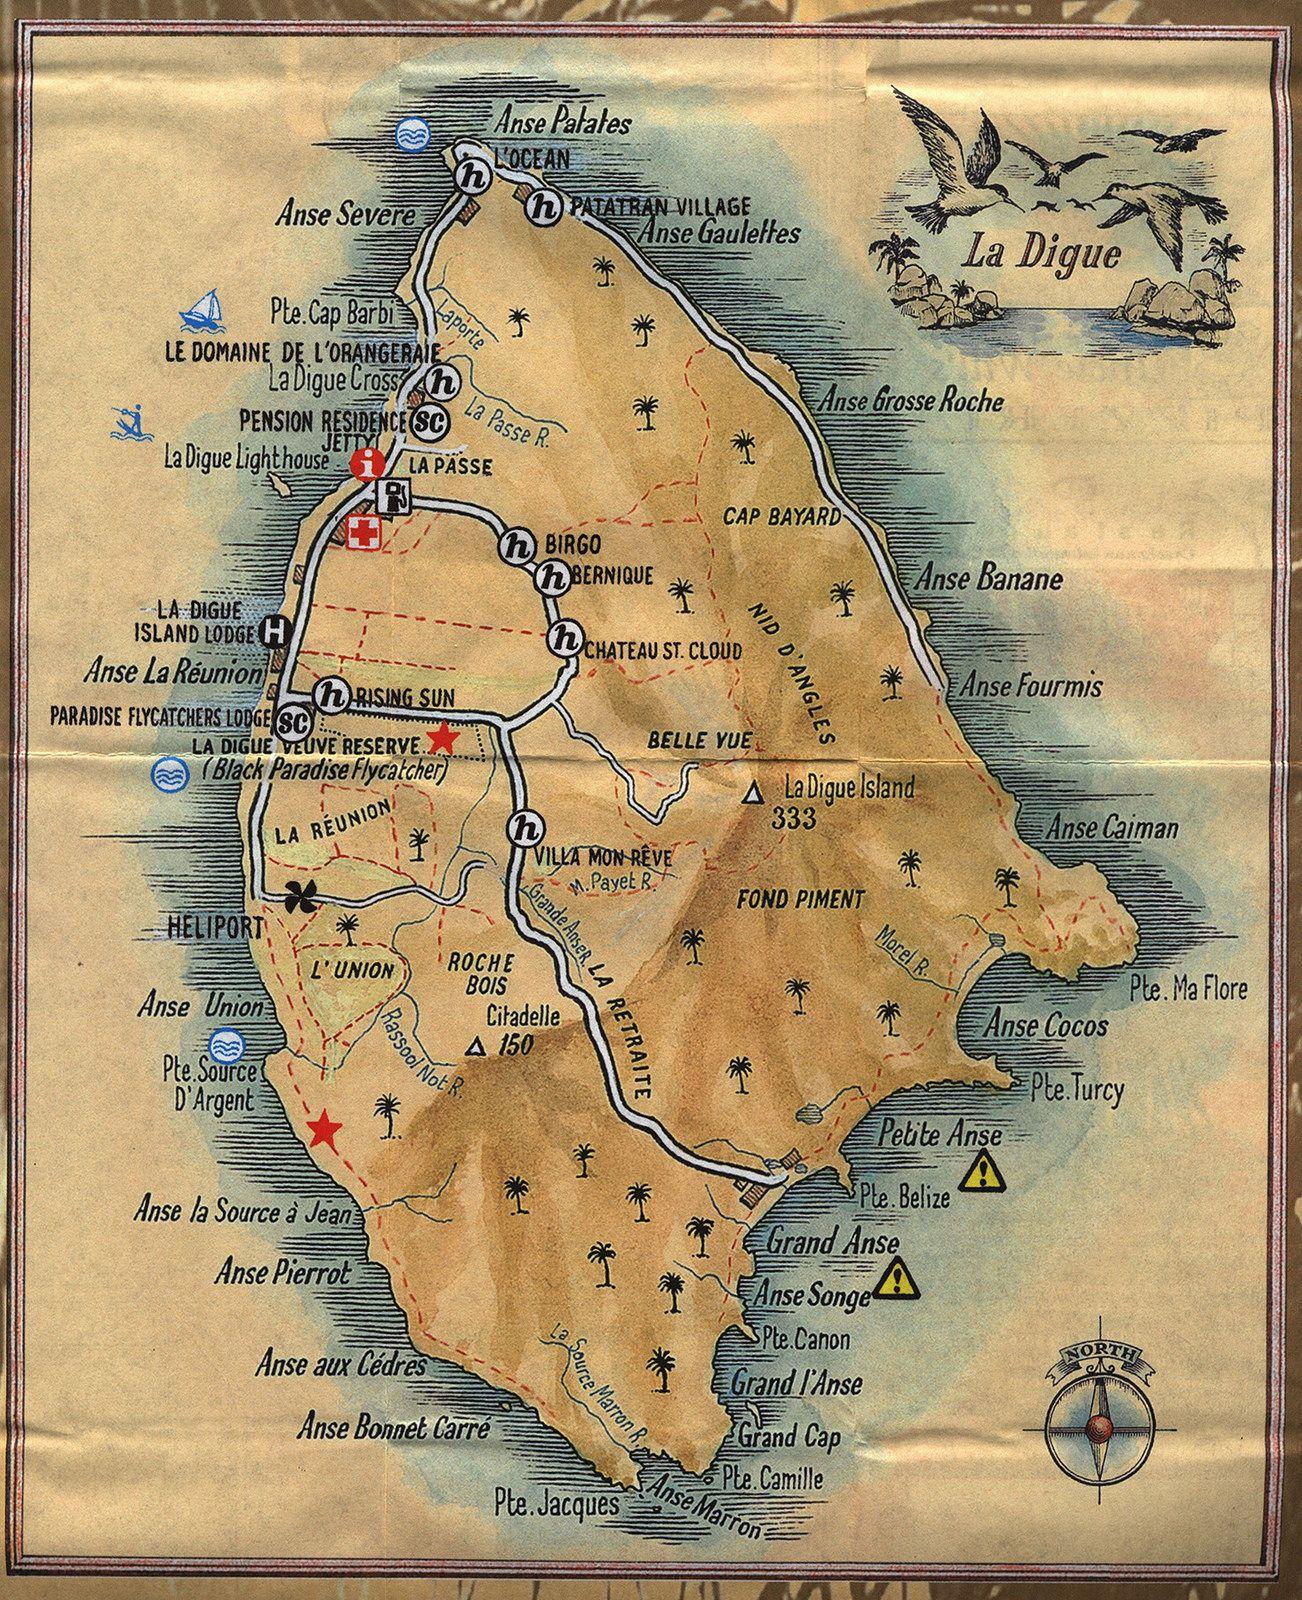 Seychelles including Maps of Victoria Mahe Praslin La Digue